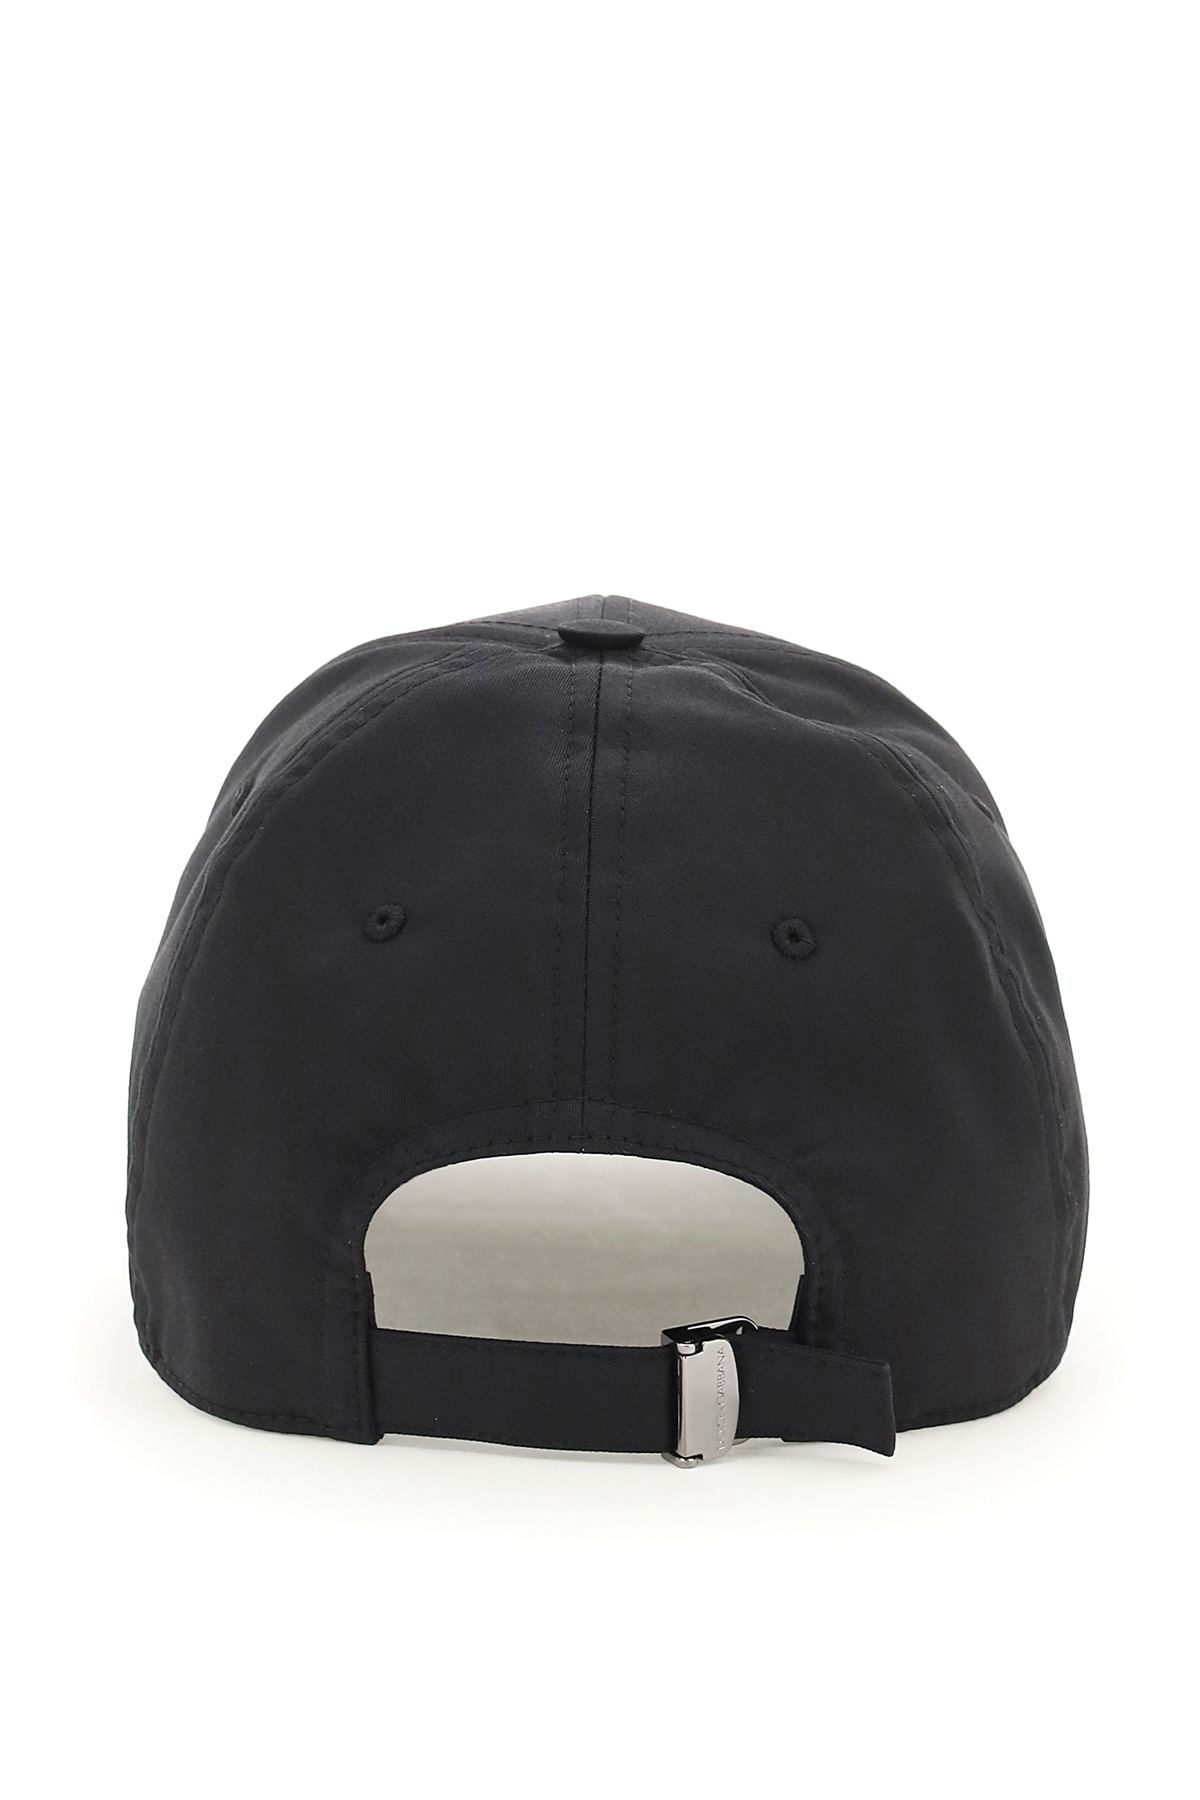 Dolce & gabbana cappello da baseball con placca logo